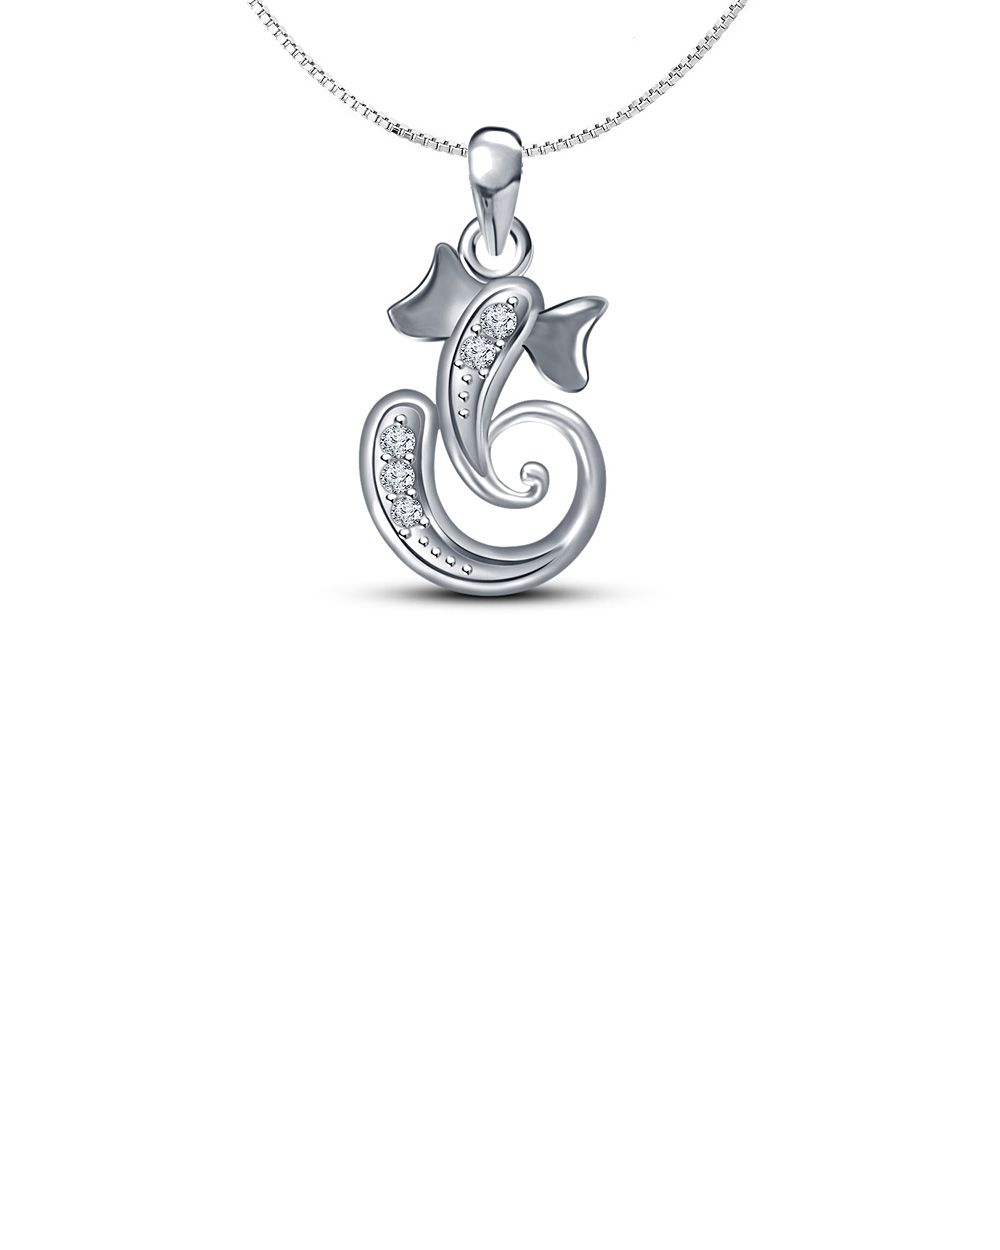 2a0fe3651 Real Diamond Sterling Silver Ganesh Ganpati Pendant With Silver Chain